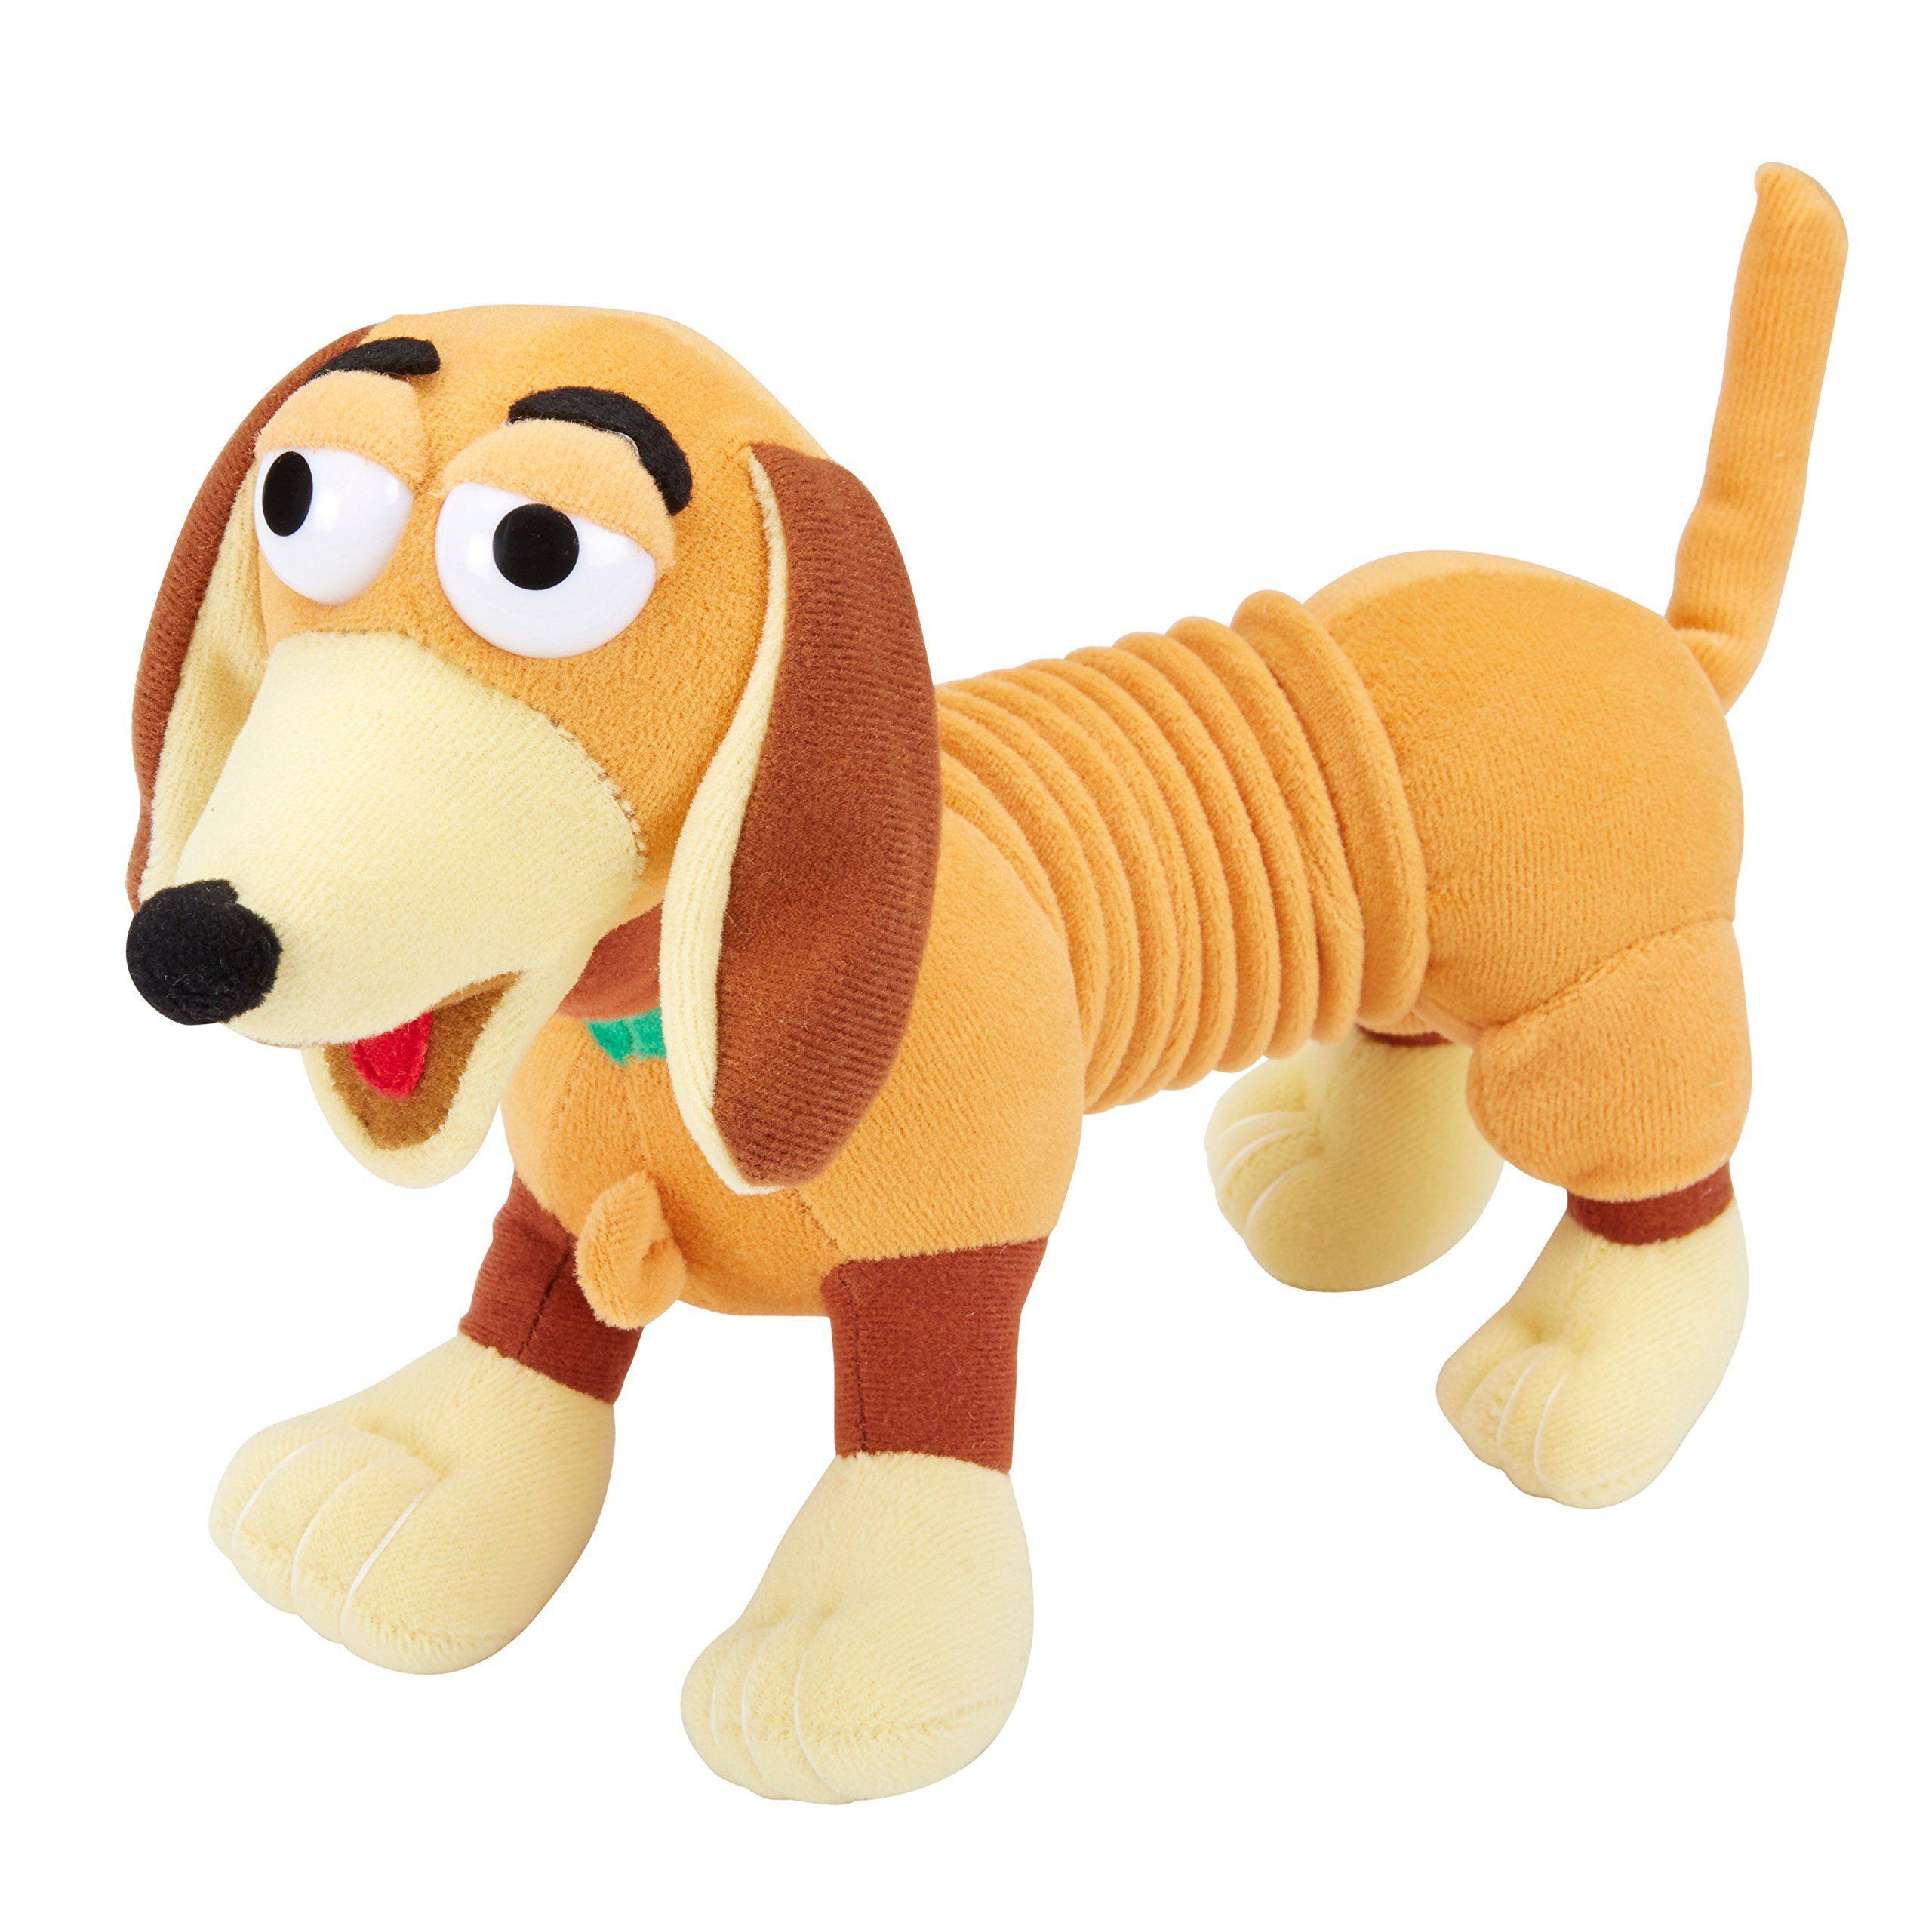 Slinky Disney Pixar Toy Story Plush Dog Click Image For More